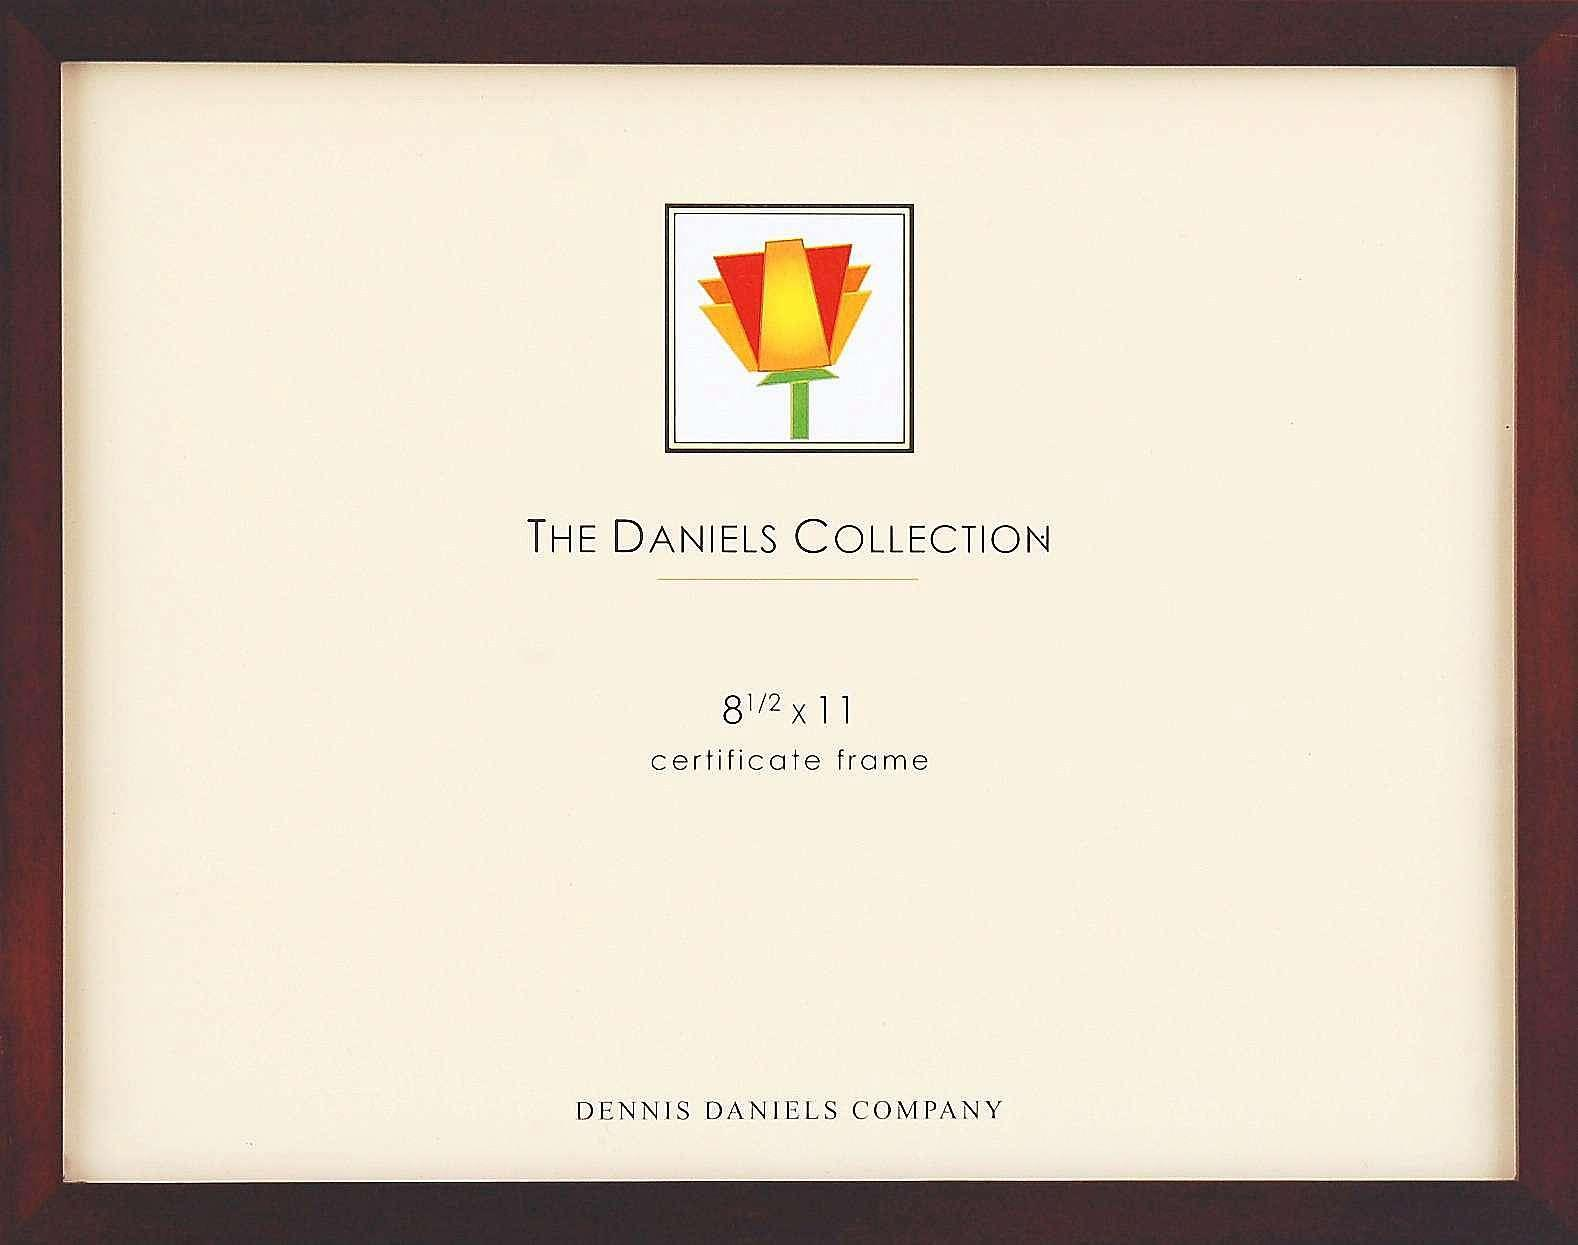 Dennis Daniels Designs